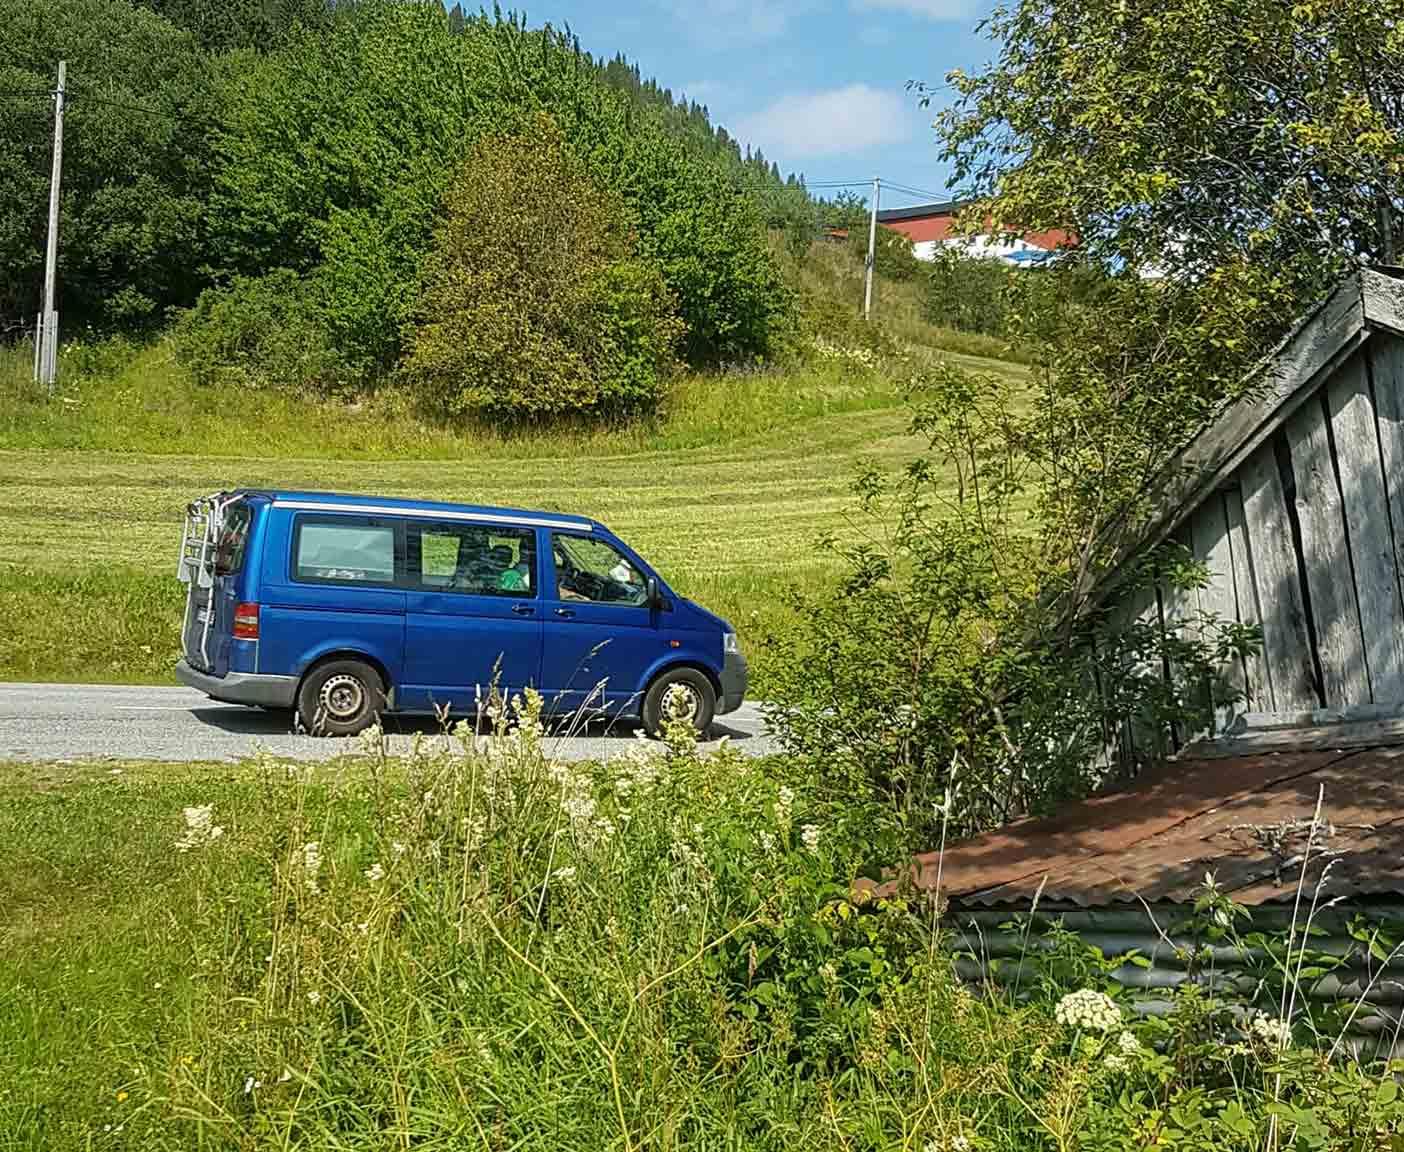 VW-T5-transporter-multivan-california-tuning-camper-bus